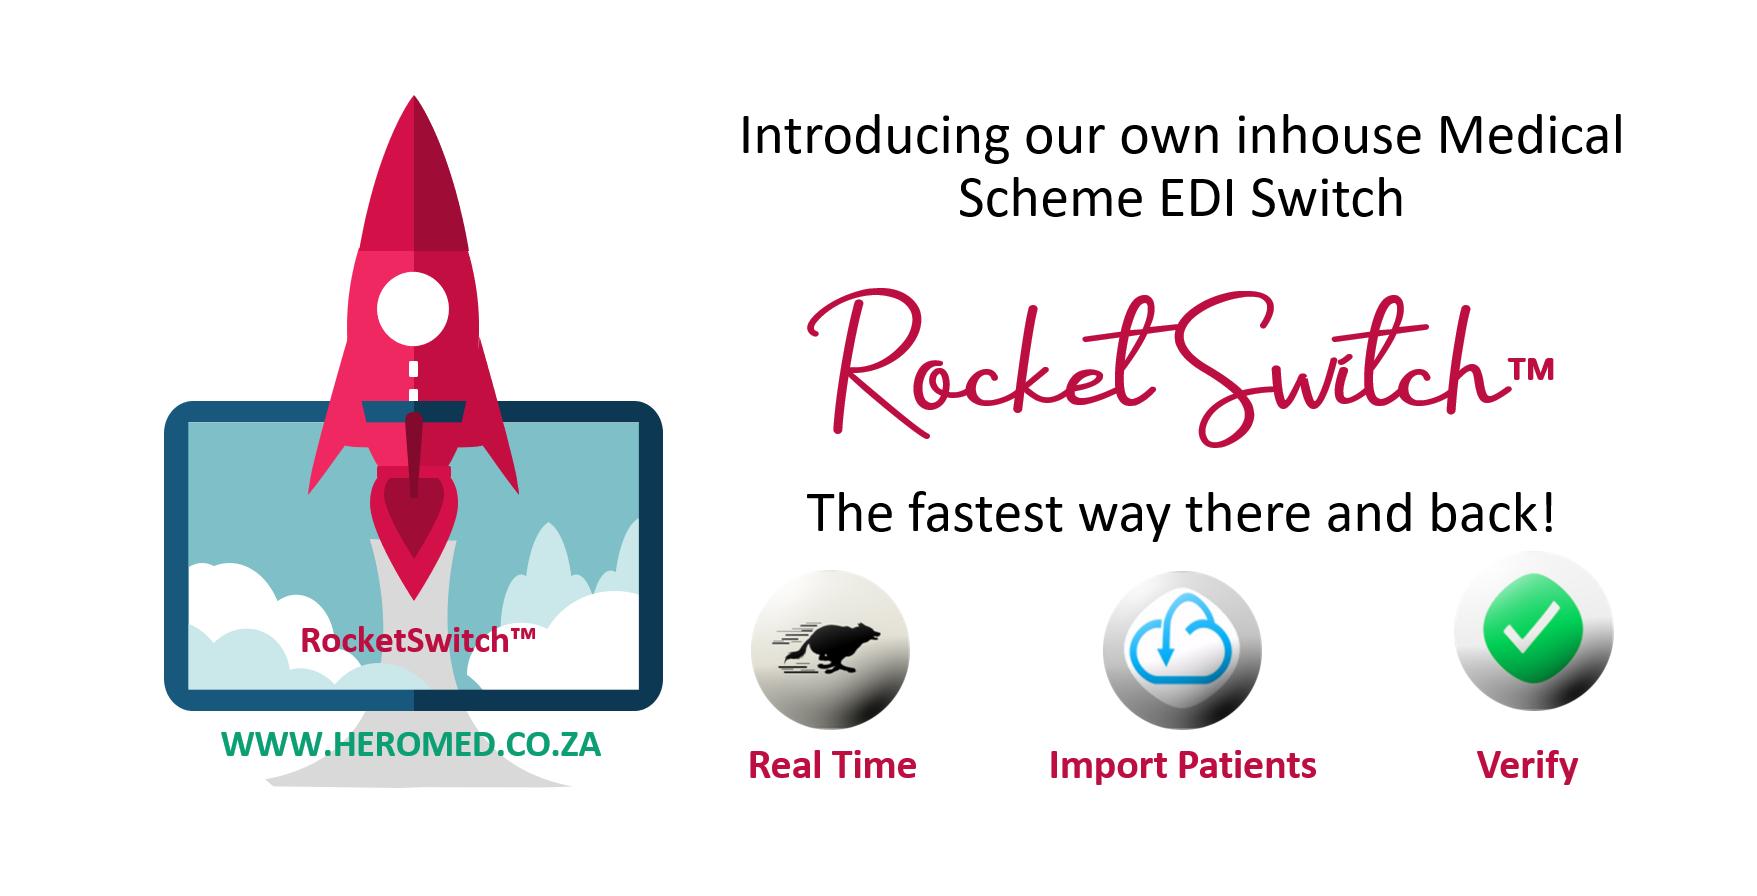 Medical Practice Management tools. EDI Switch Digital online tools Medical scheme switch